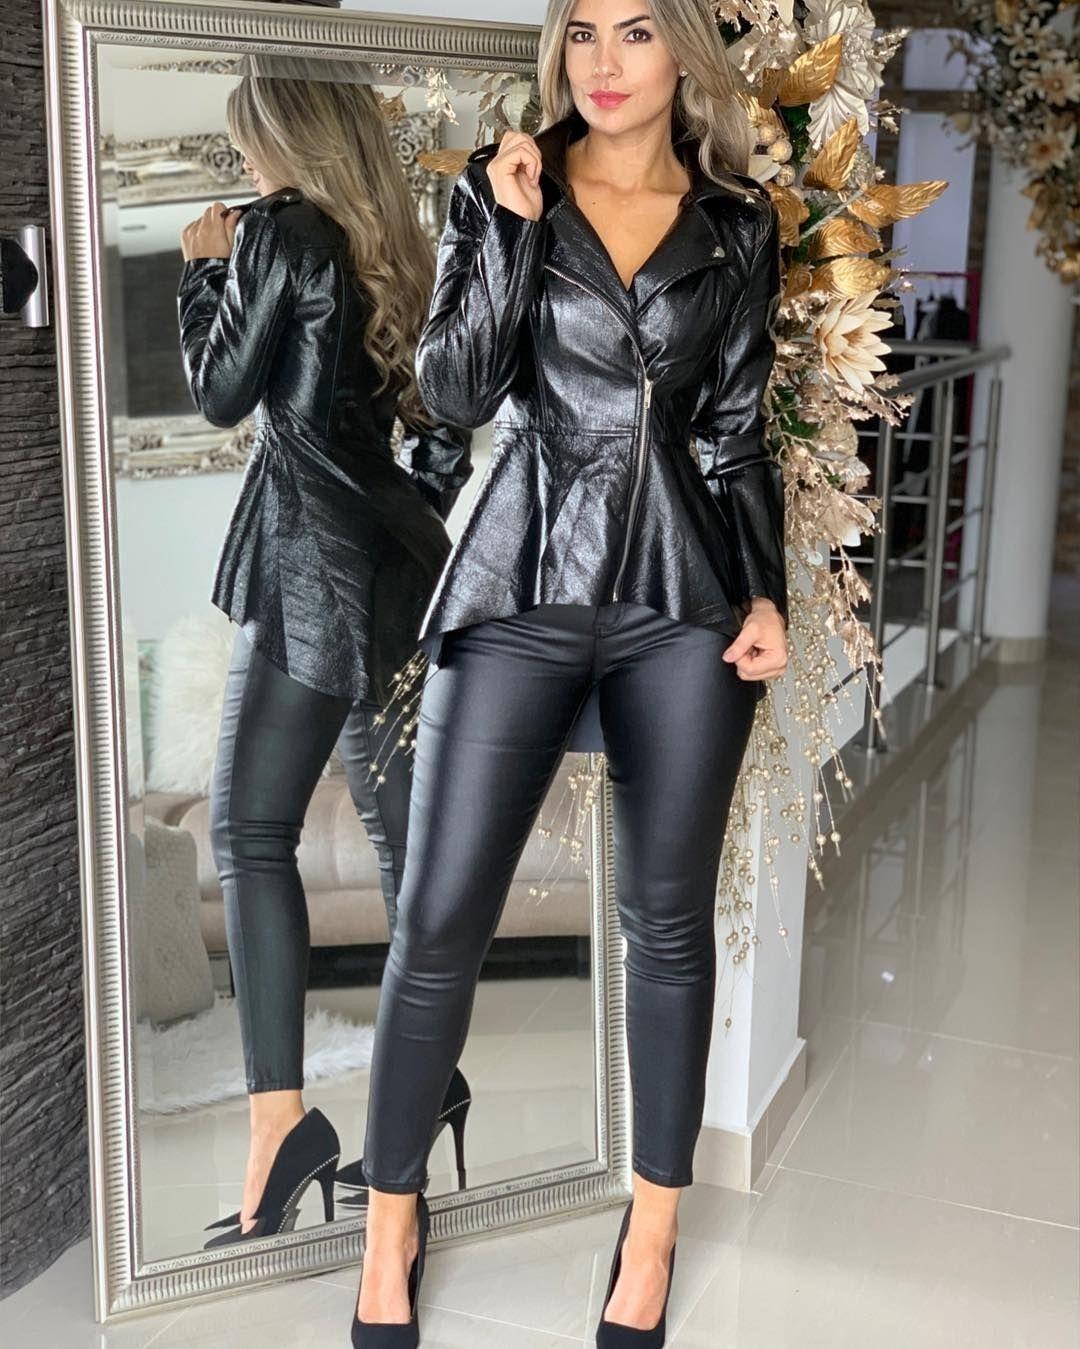 Lederlady ️ | Kleidung, Schwarze kleidung, Bekleidung